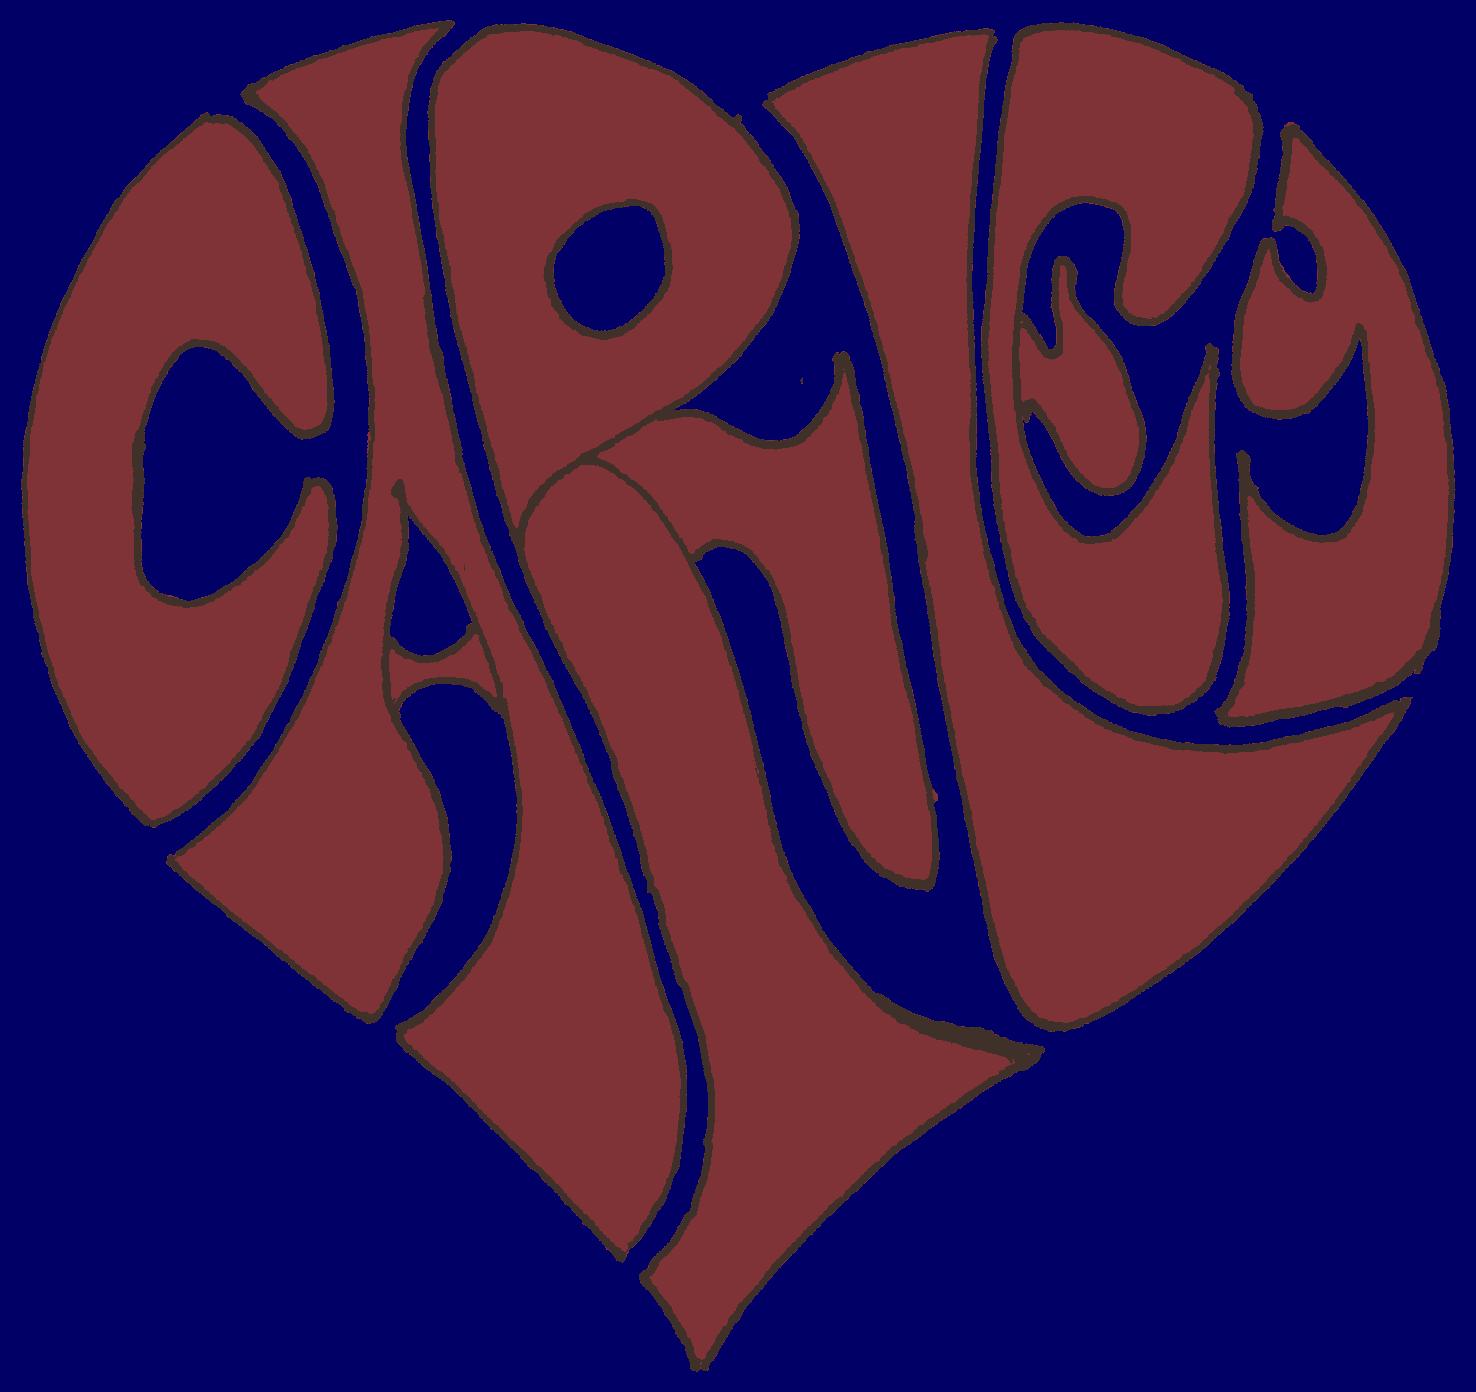 Carley Heart